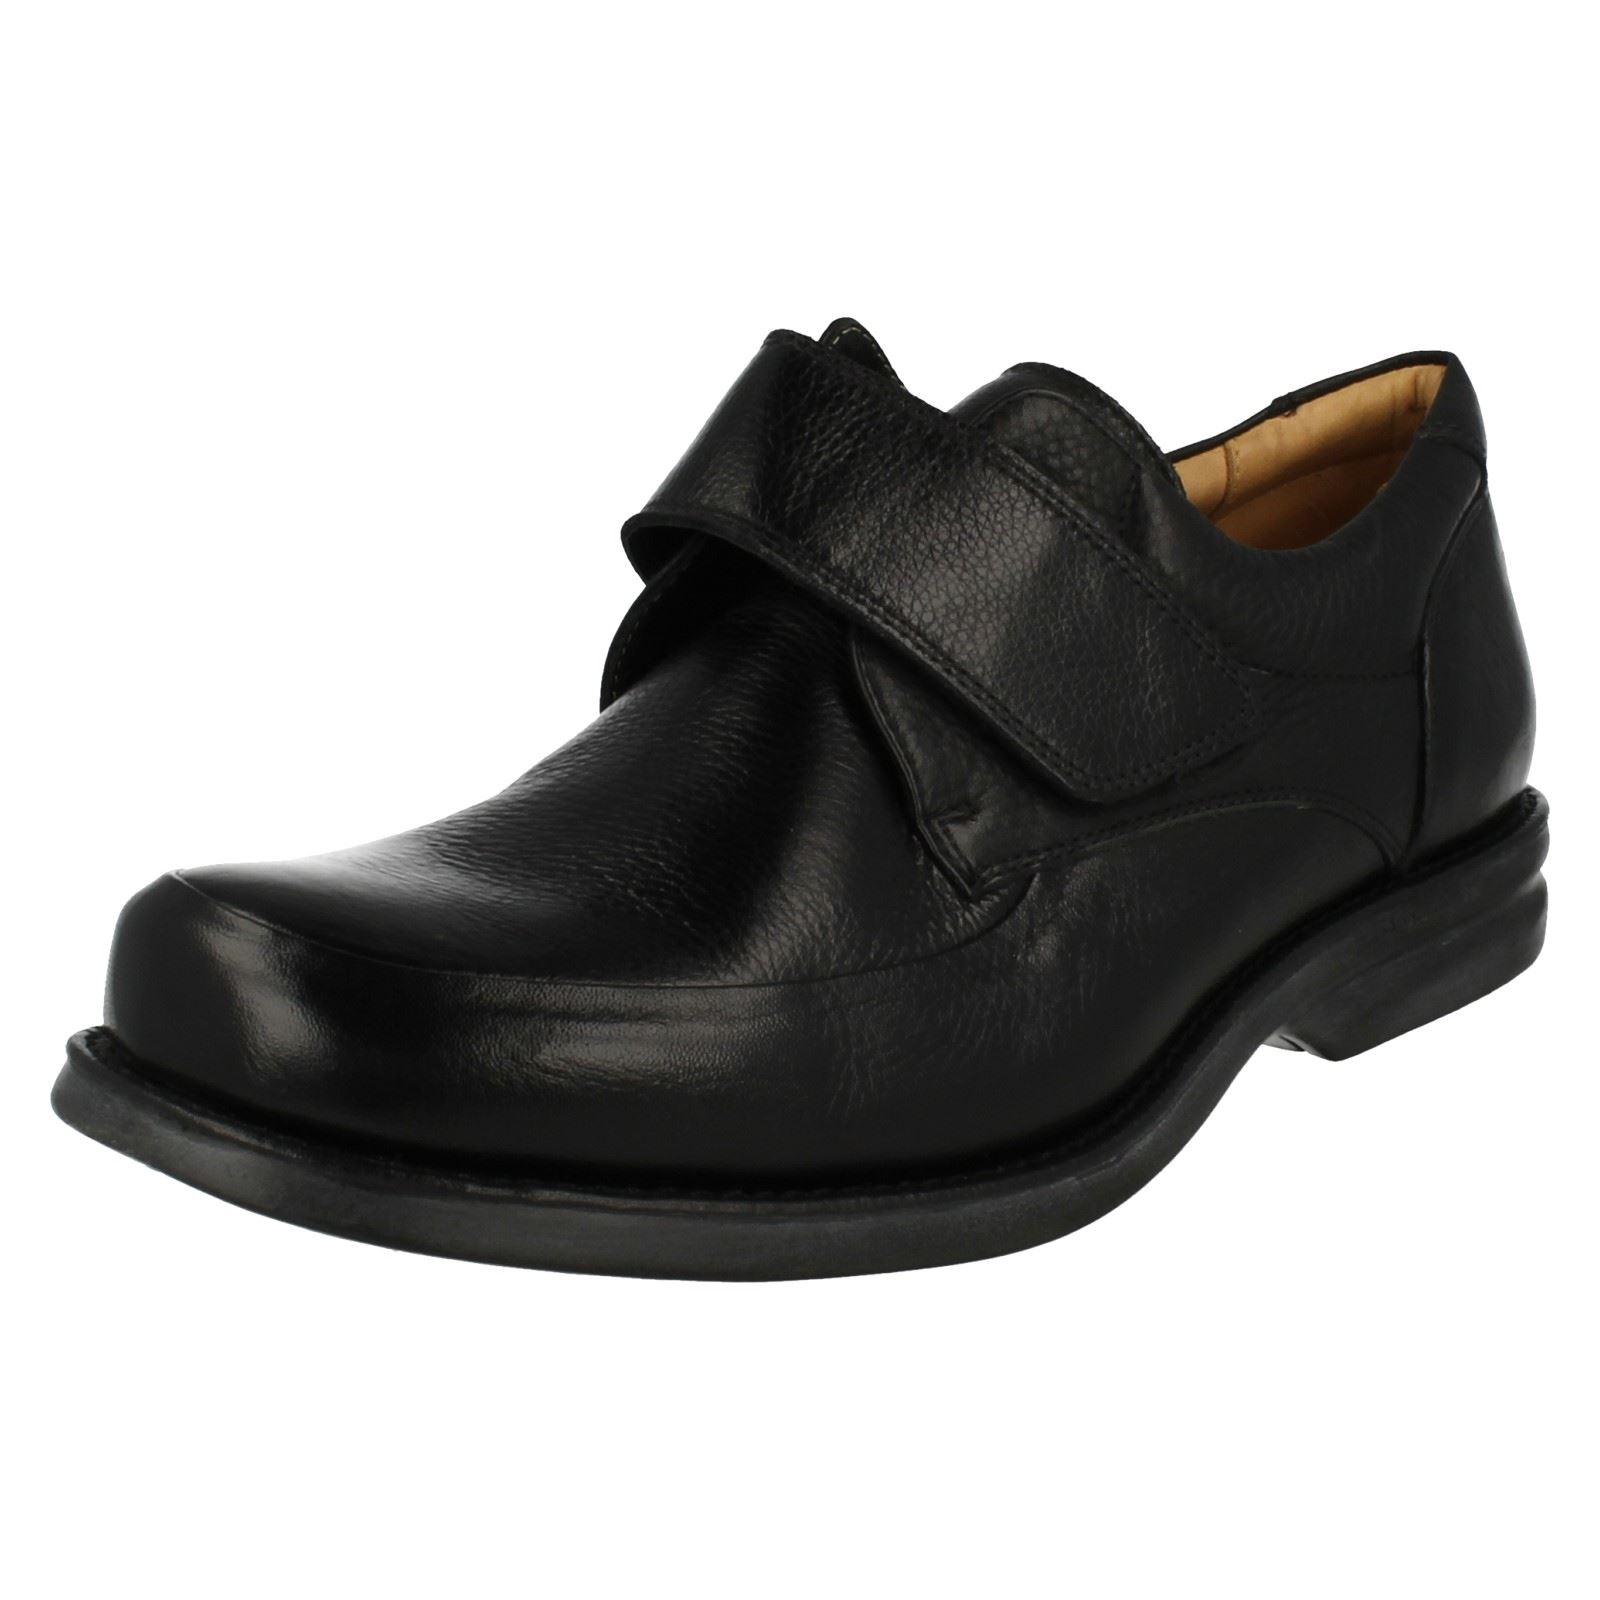 mens anatomic tapajos smart casual shoes ebay